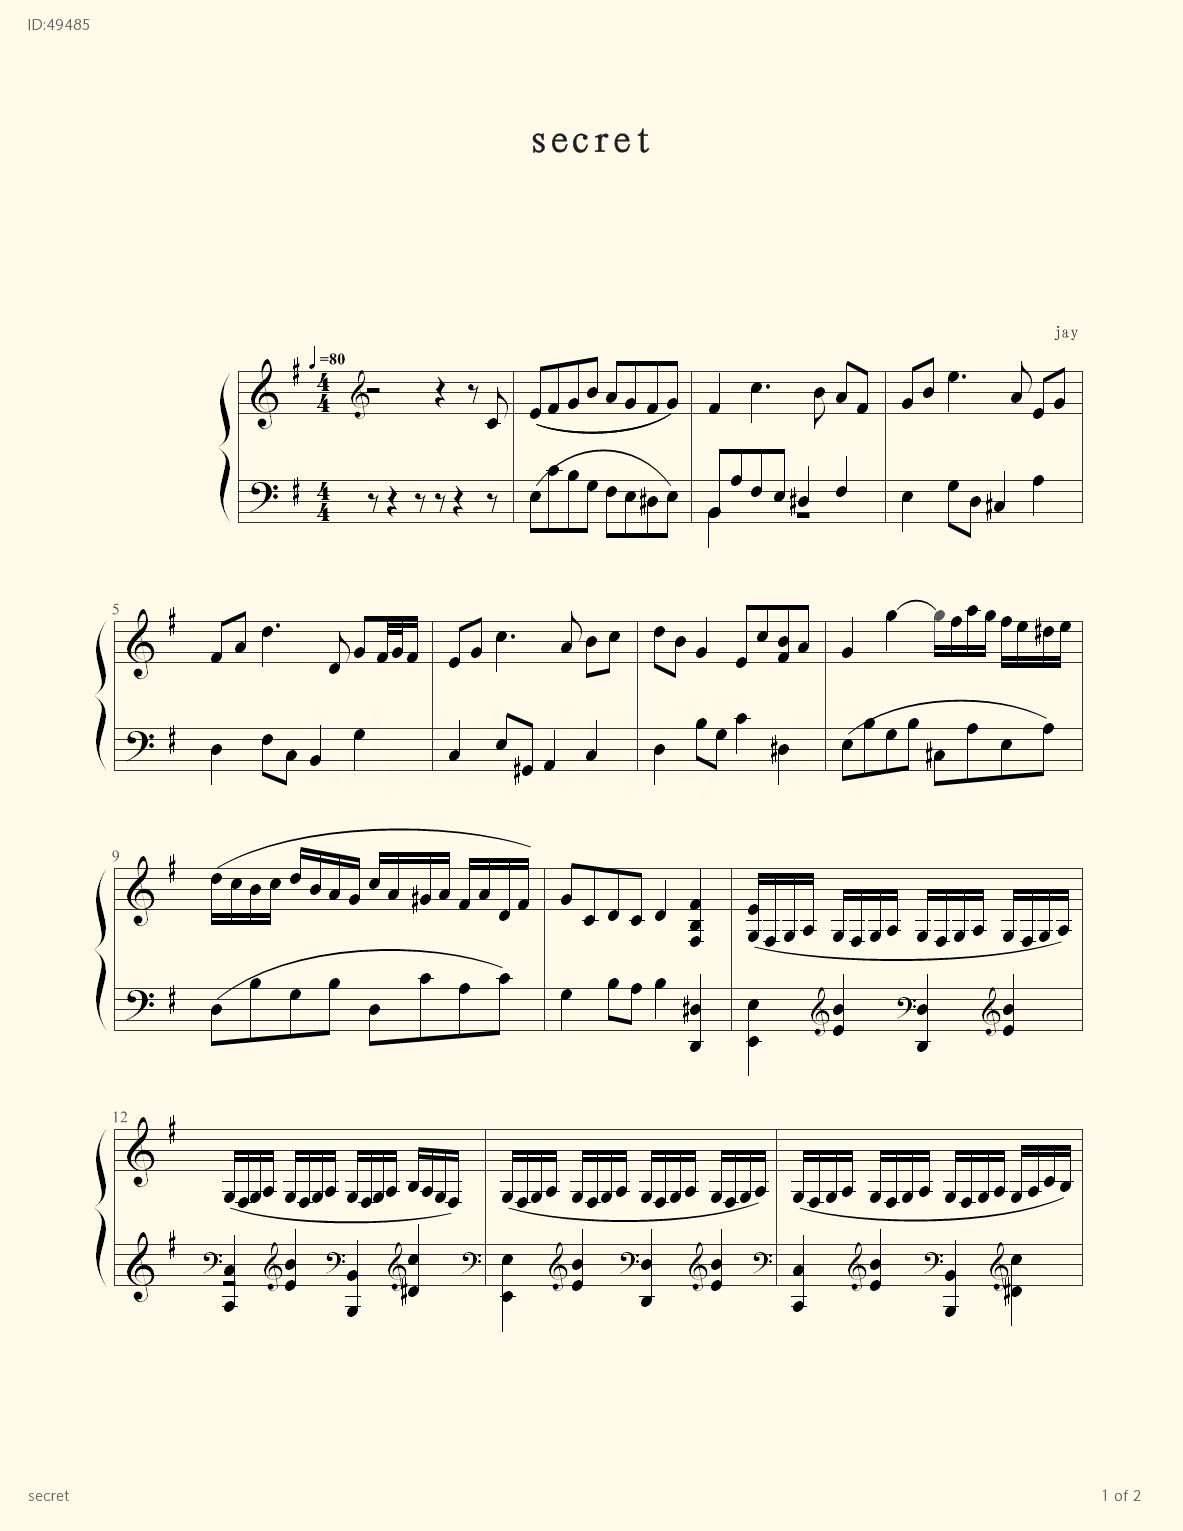 secret - Jay Chou - first page